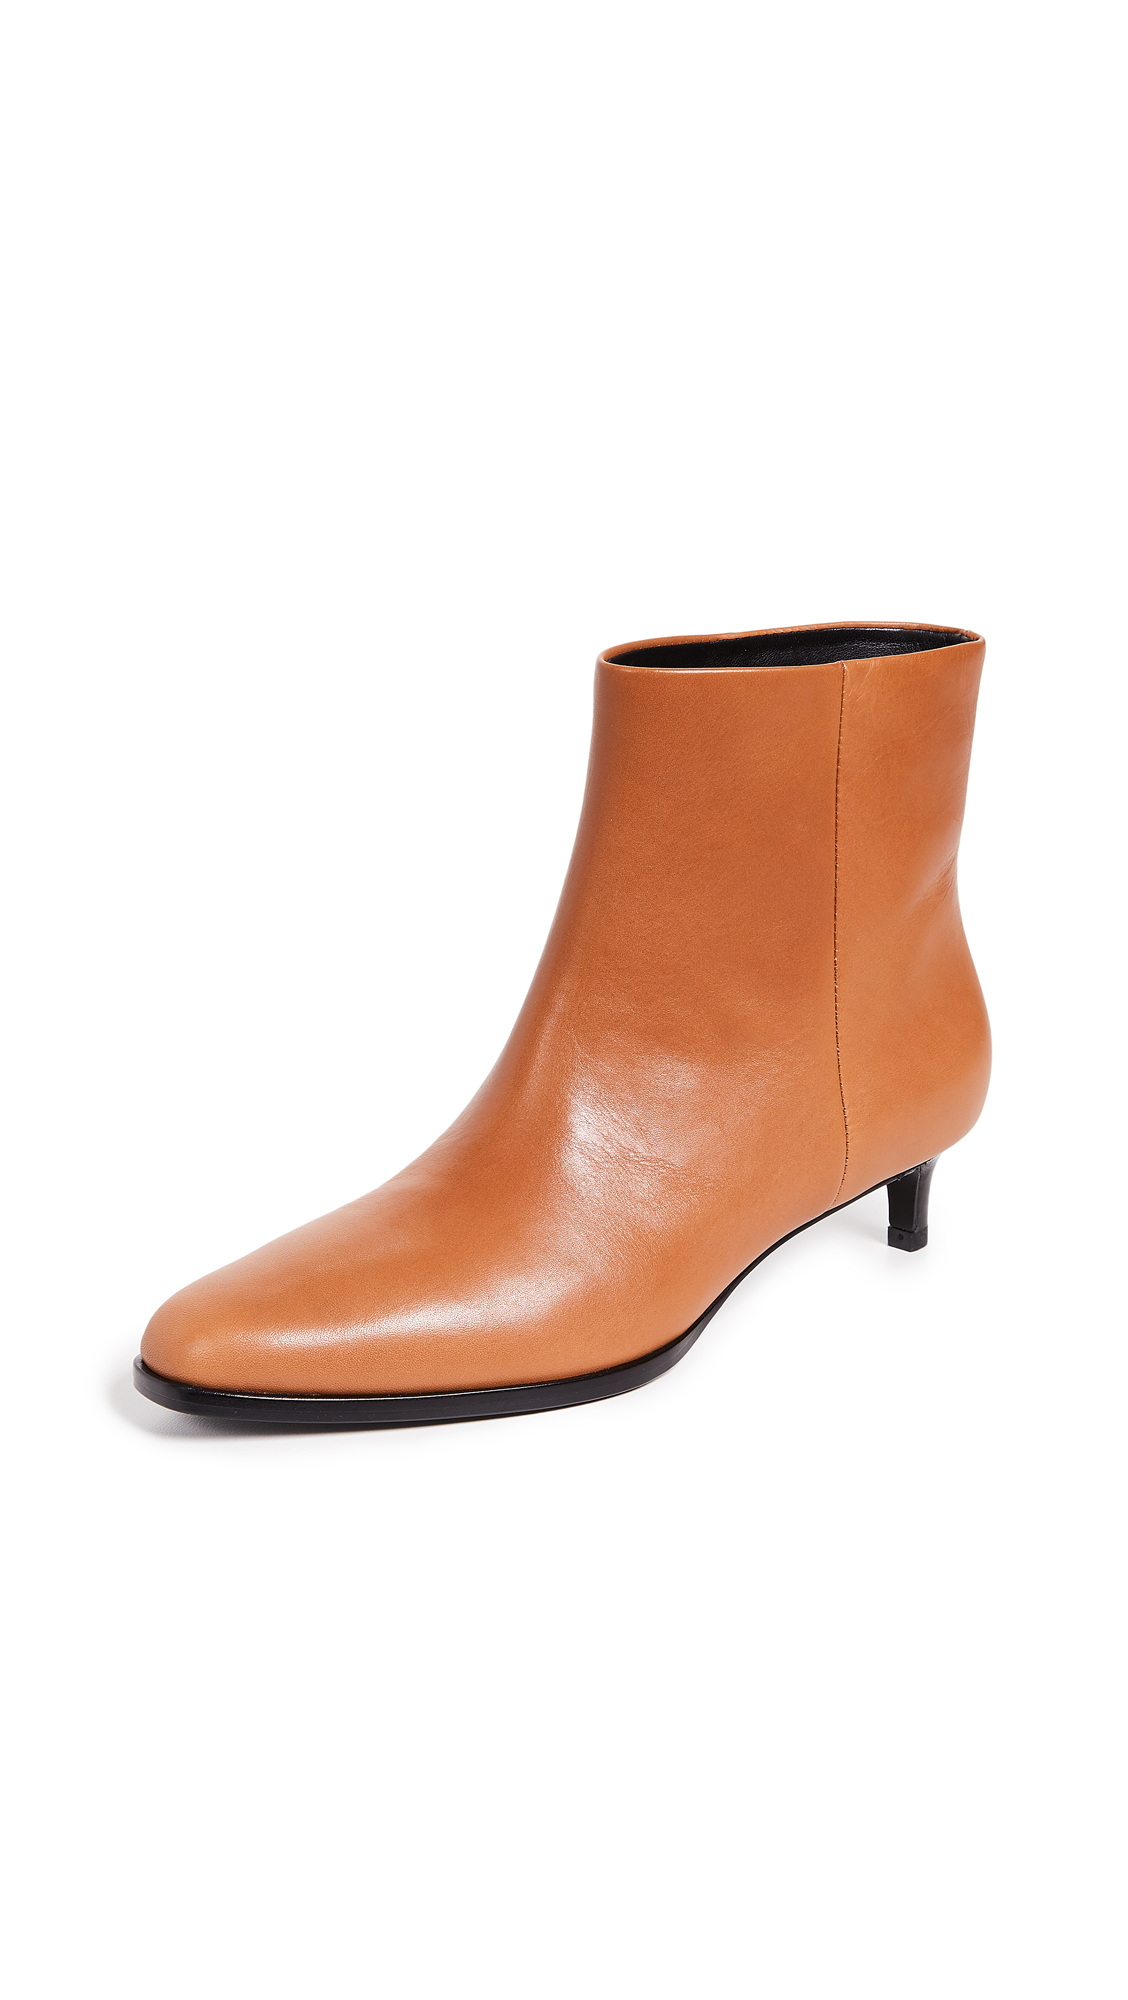 3.1 Phillip Lim Agatha Ankle Booties - Cognac